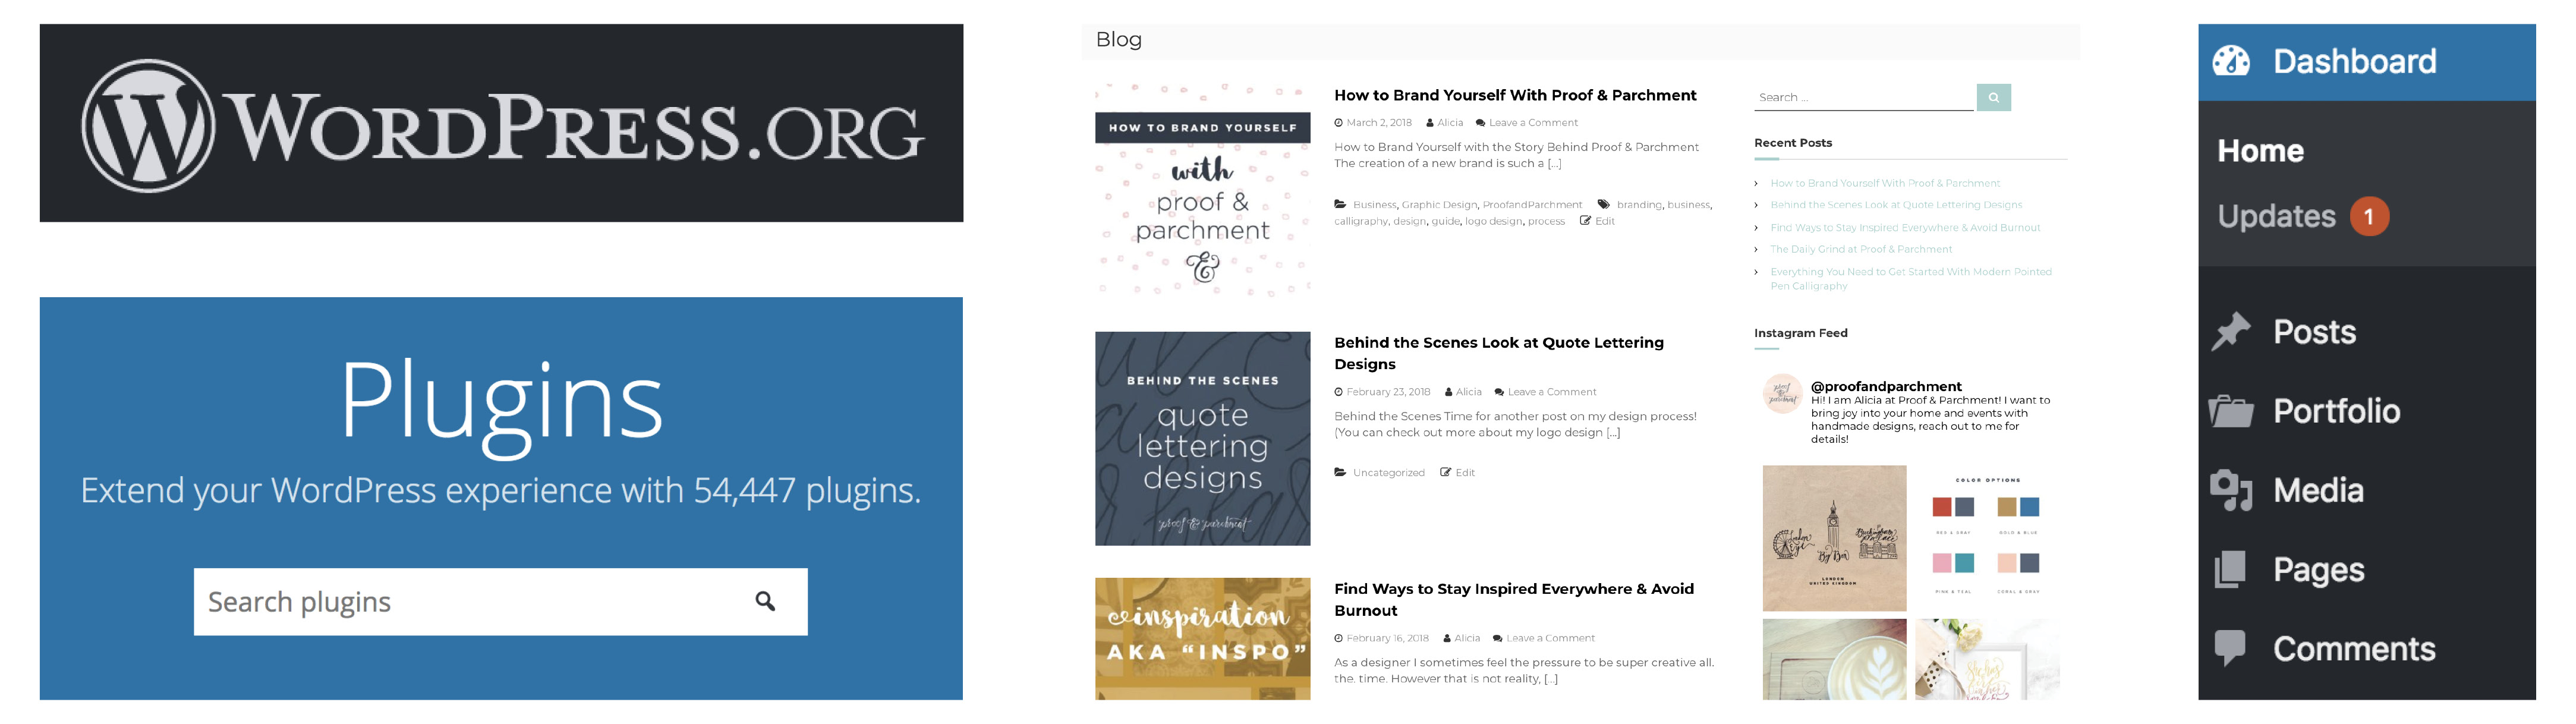 Business tool screenshots from WordPress